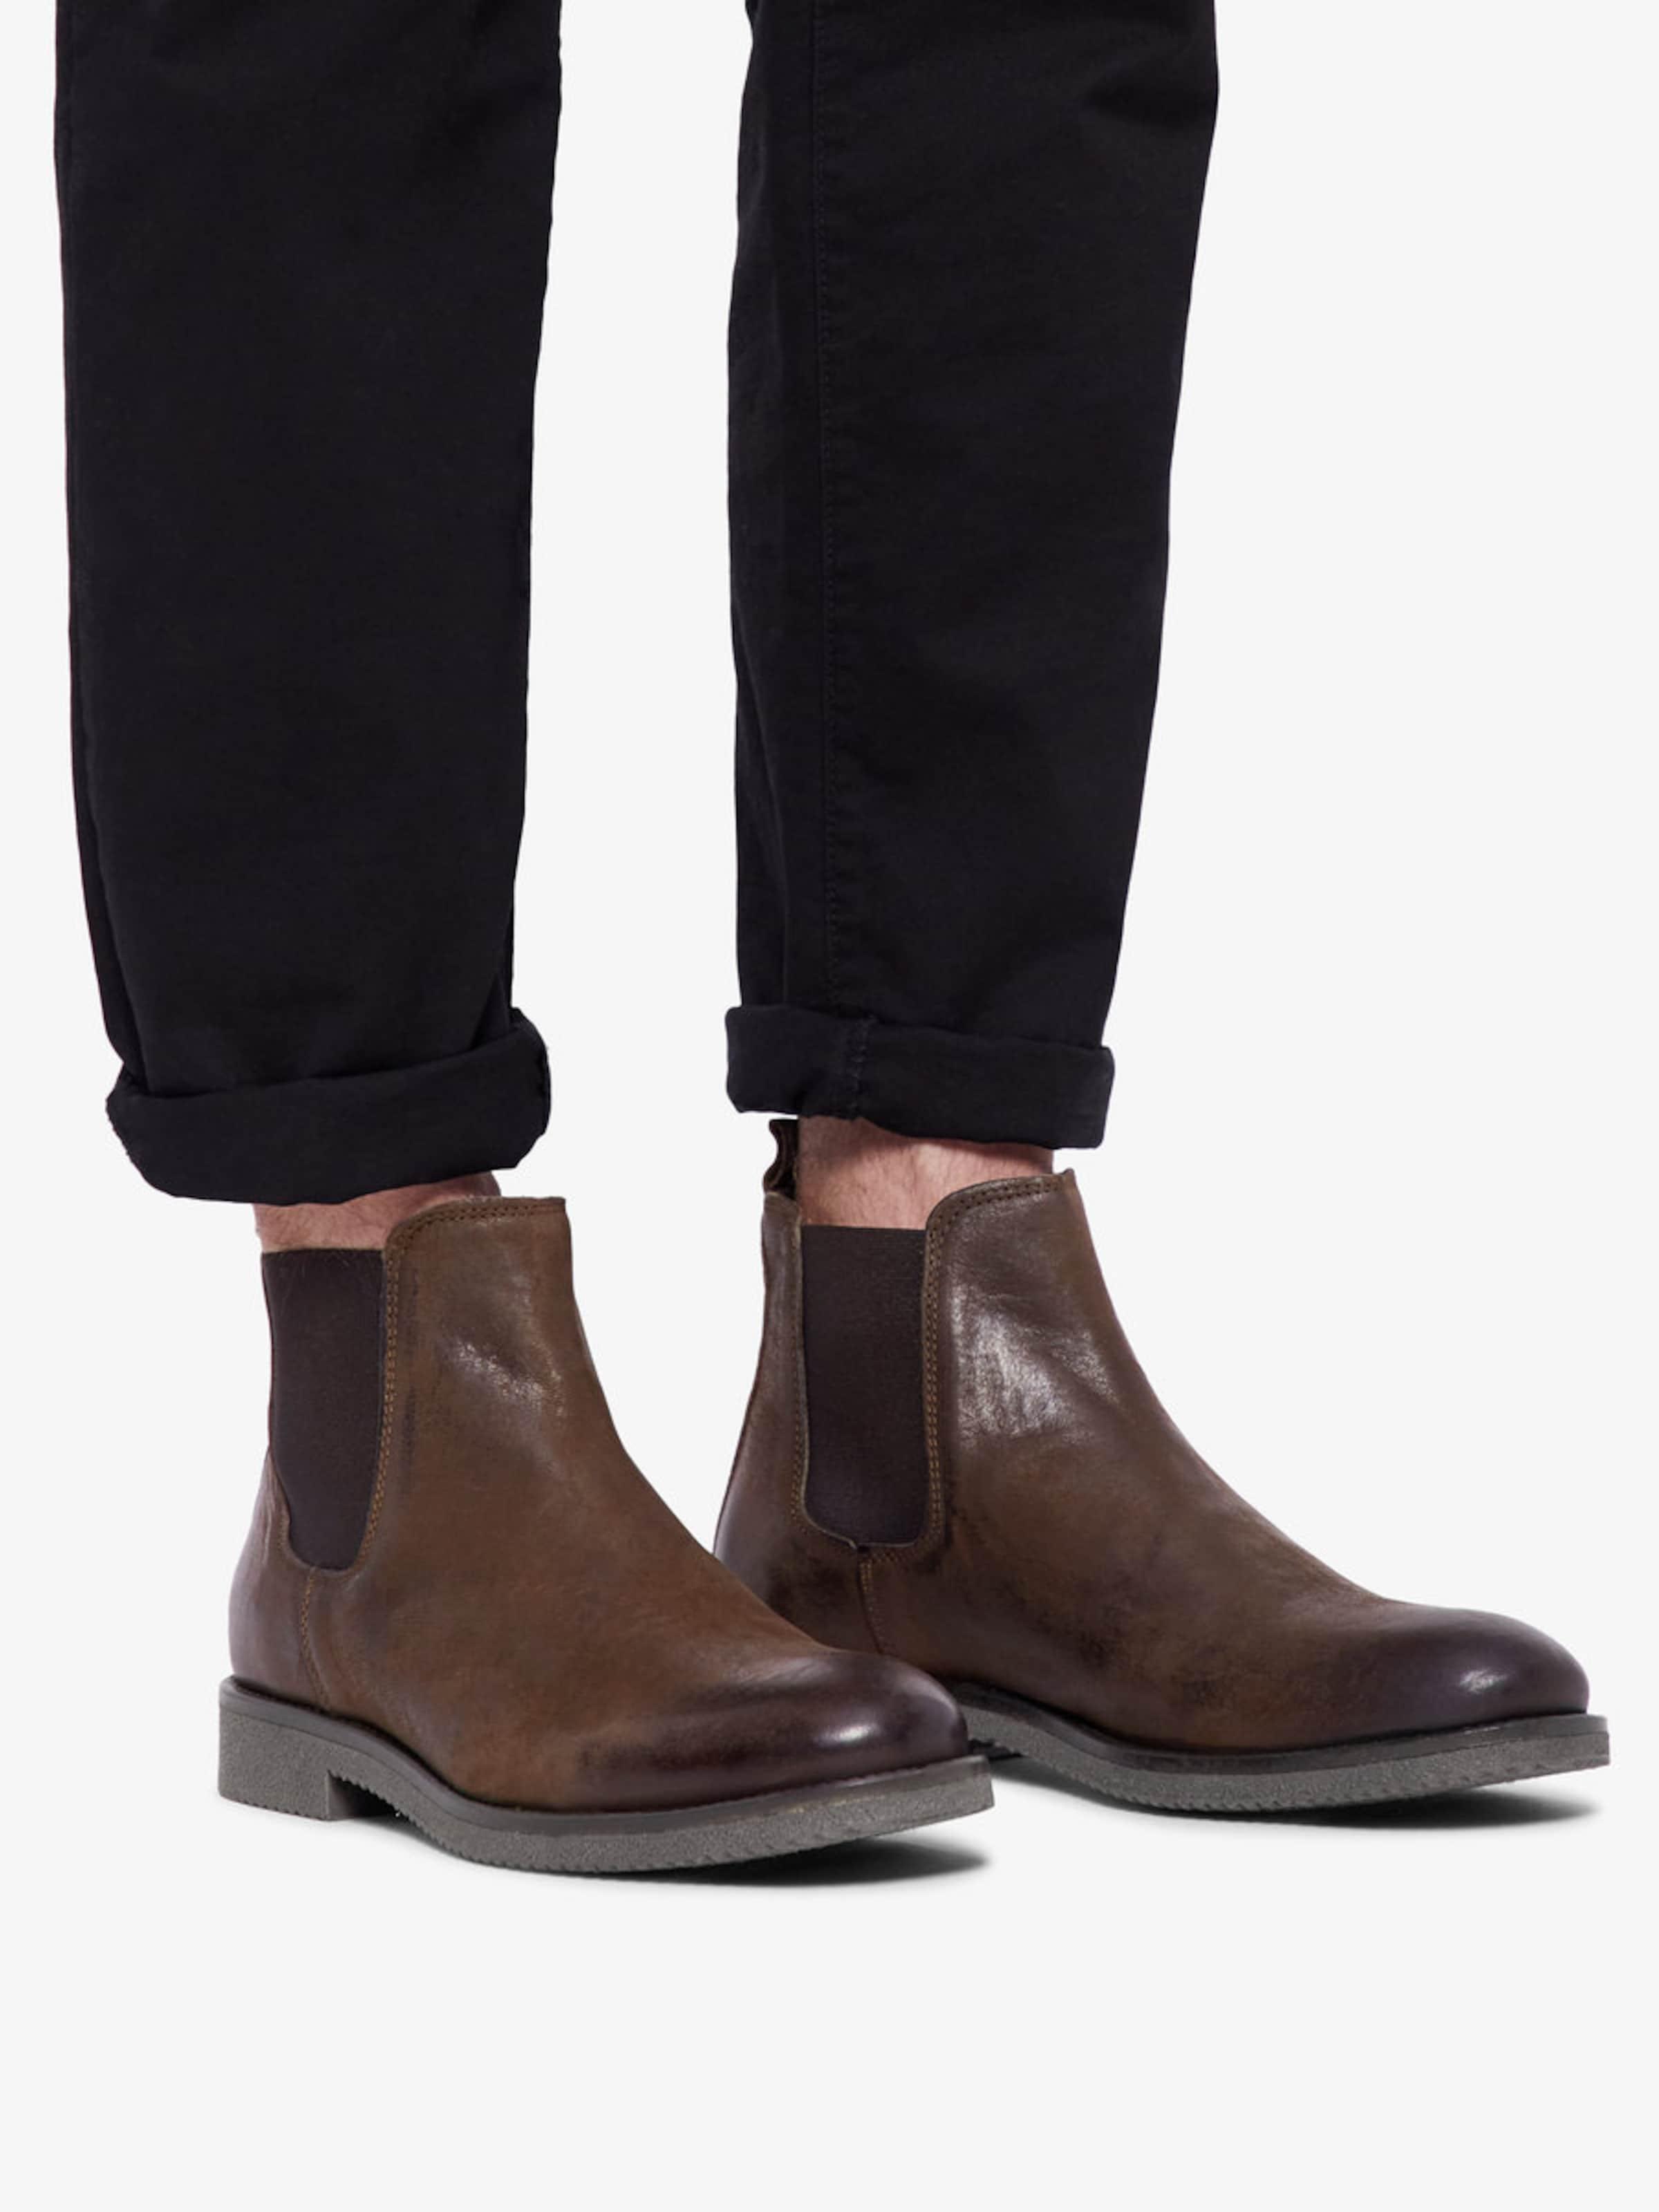 Boots In Dunkelbraun In Bianco Boots Bianco Jc3TFKl1